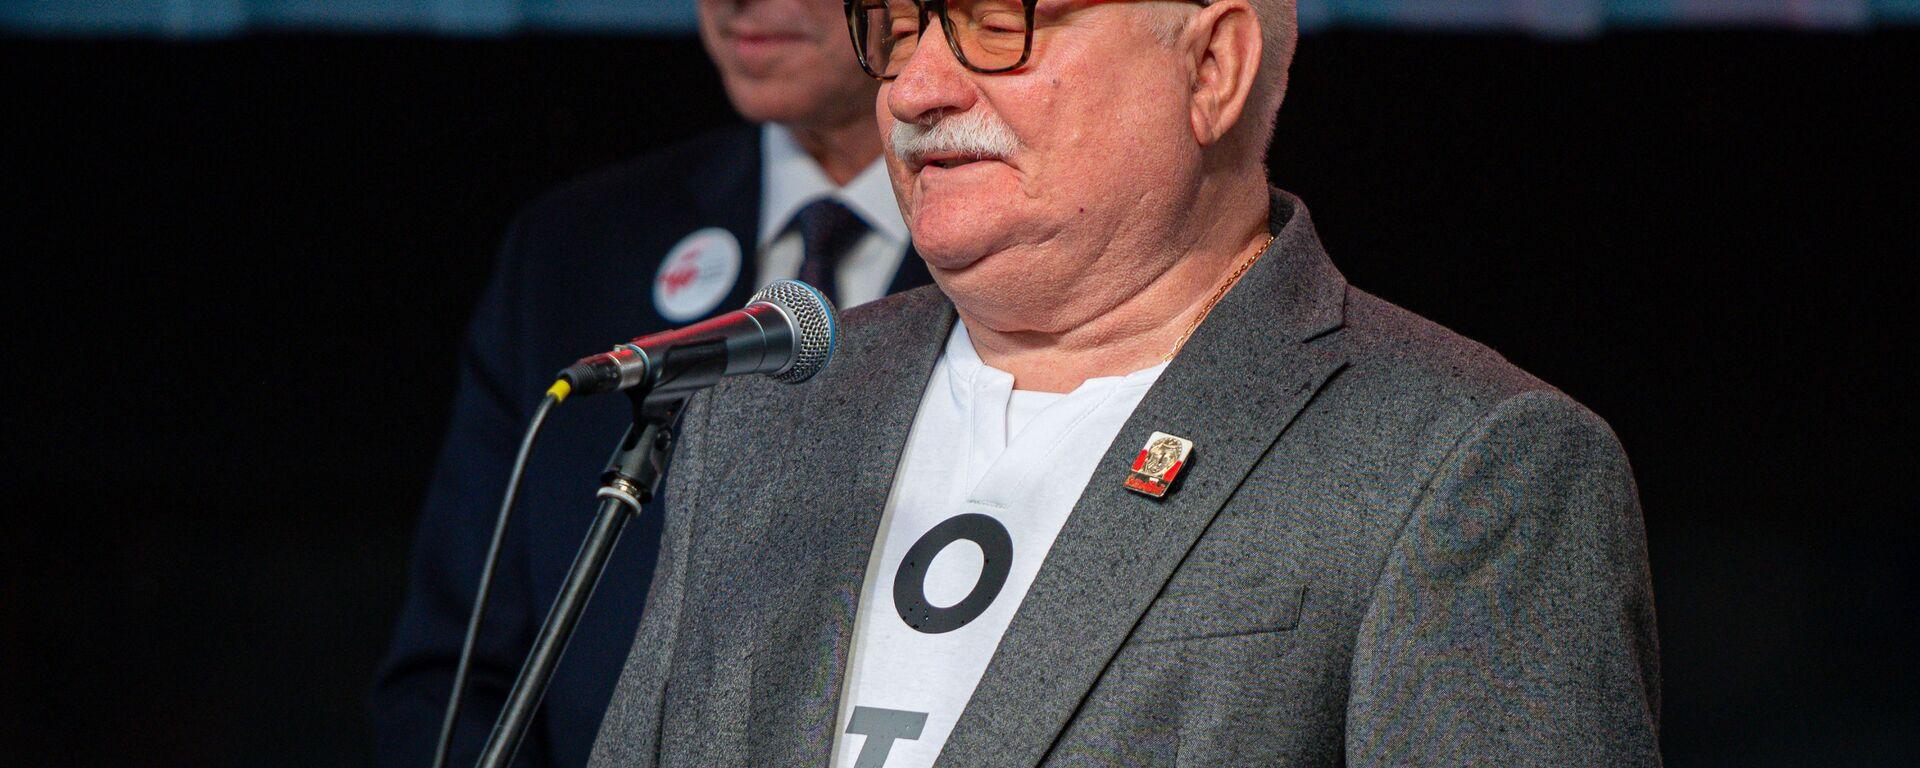 Lech Wałęsa - Sputnik Polska, 1920, 08.12.2020